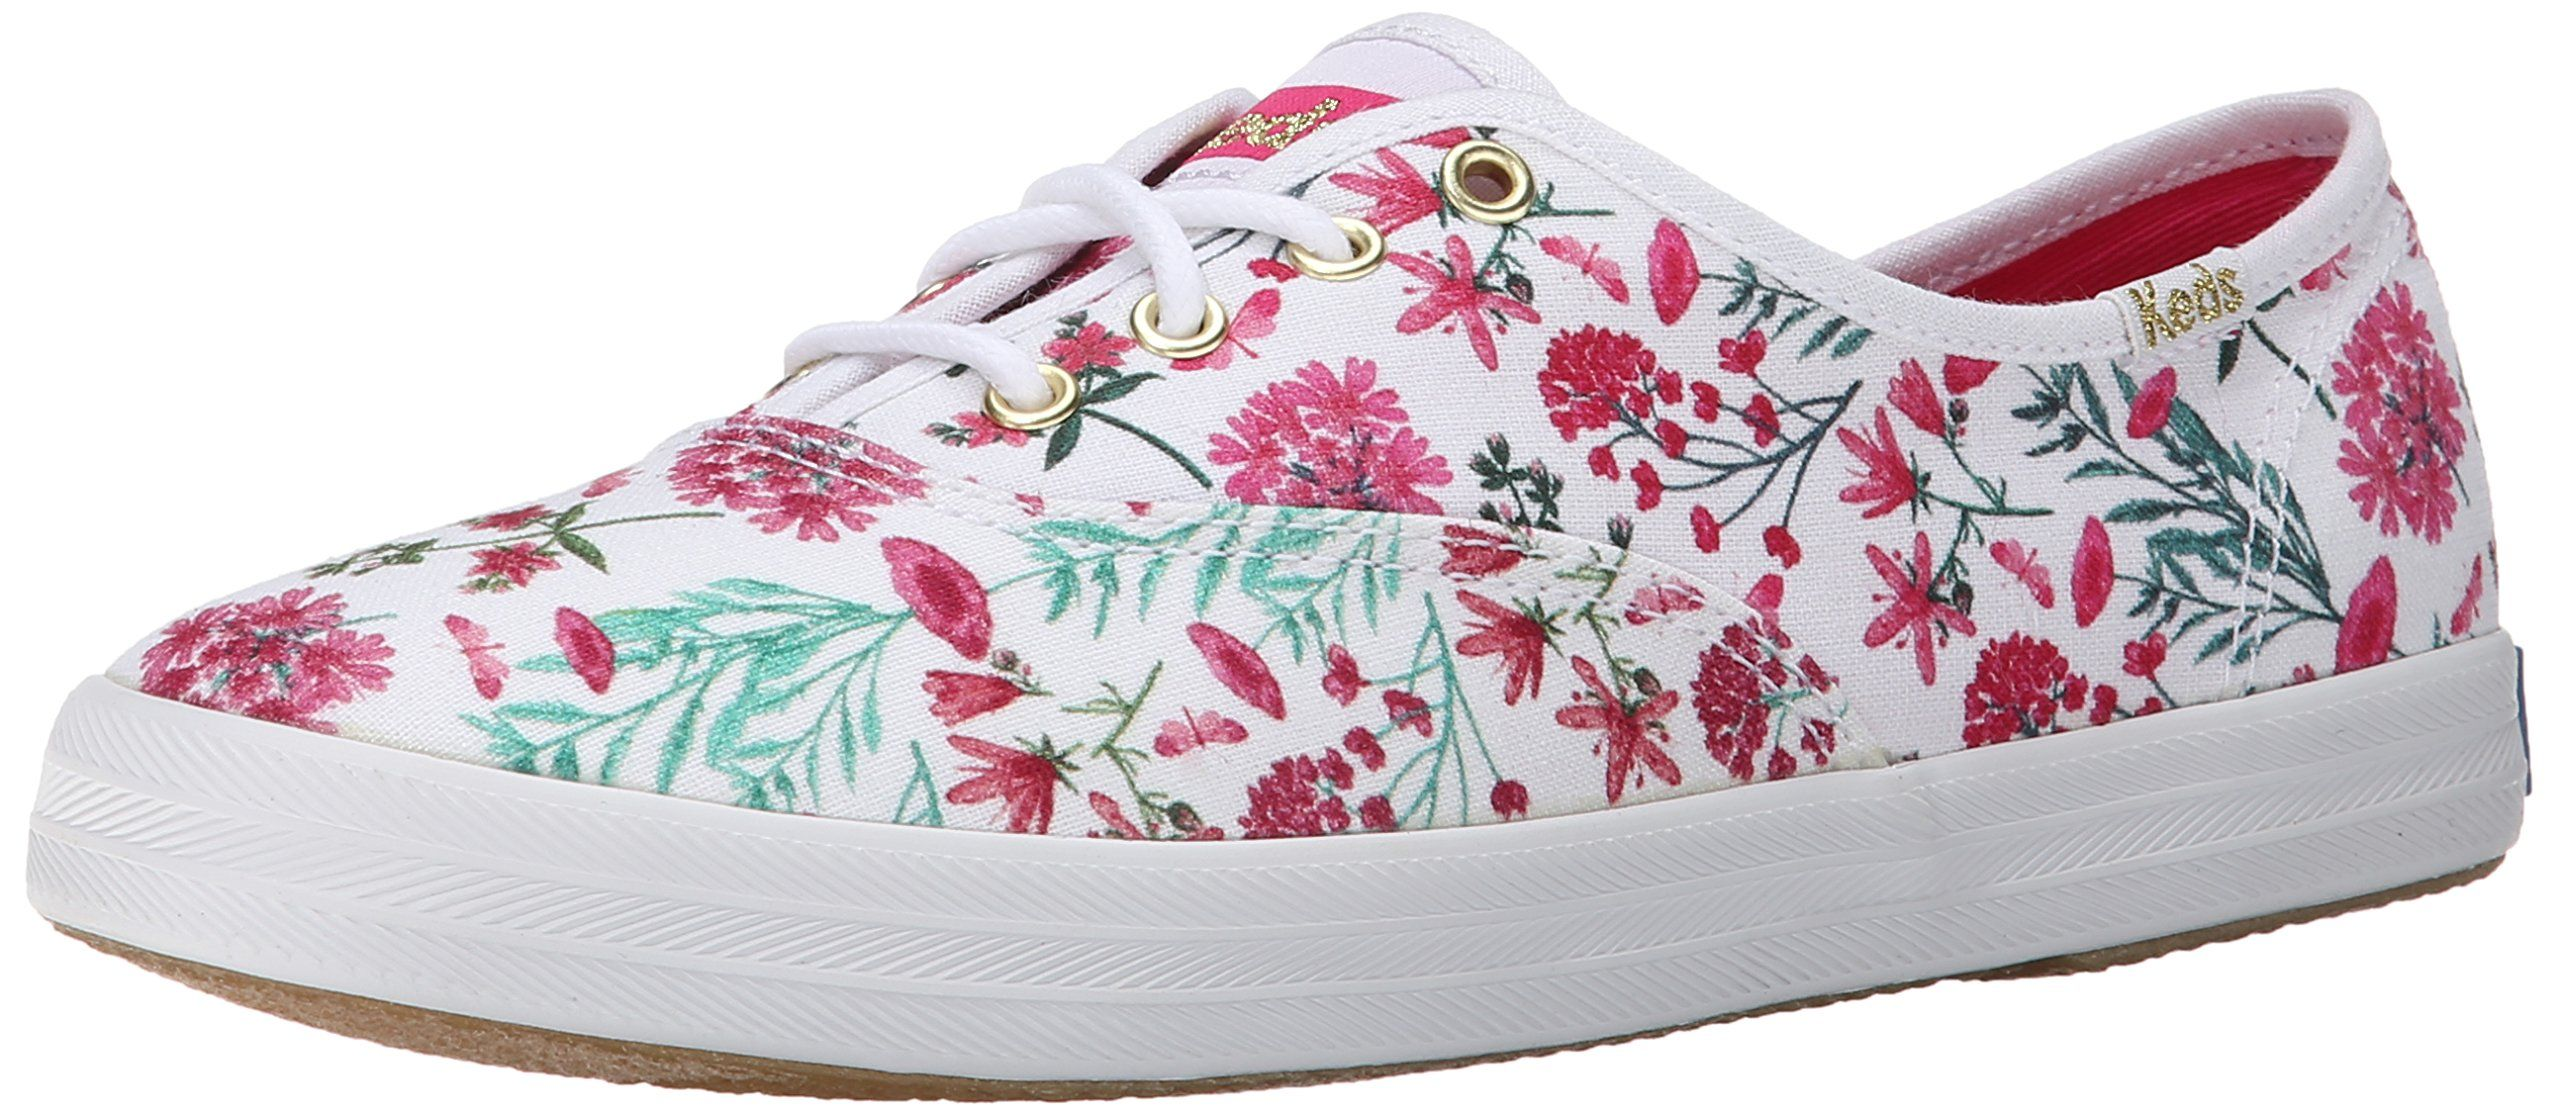 5c11fa8fc Amazon.com  Keds Women s Champion Garden Party Fashion Sneaker ...